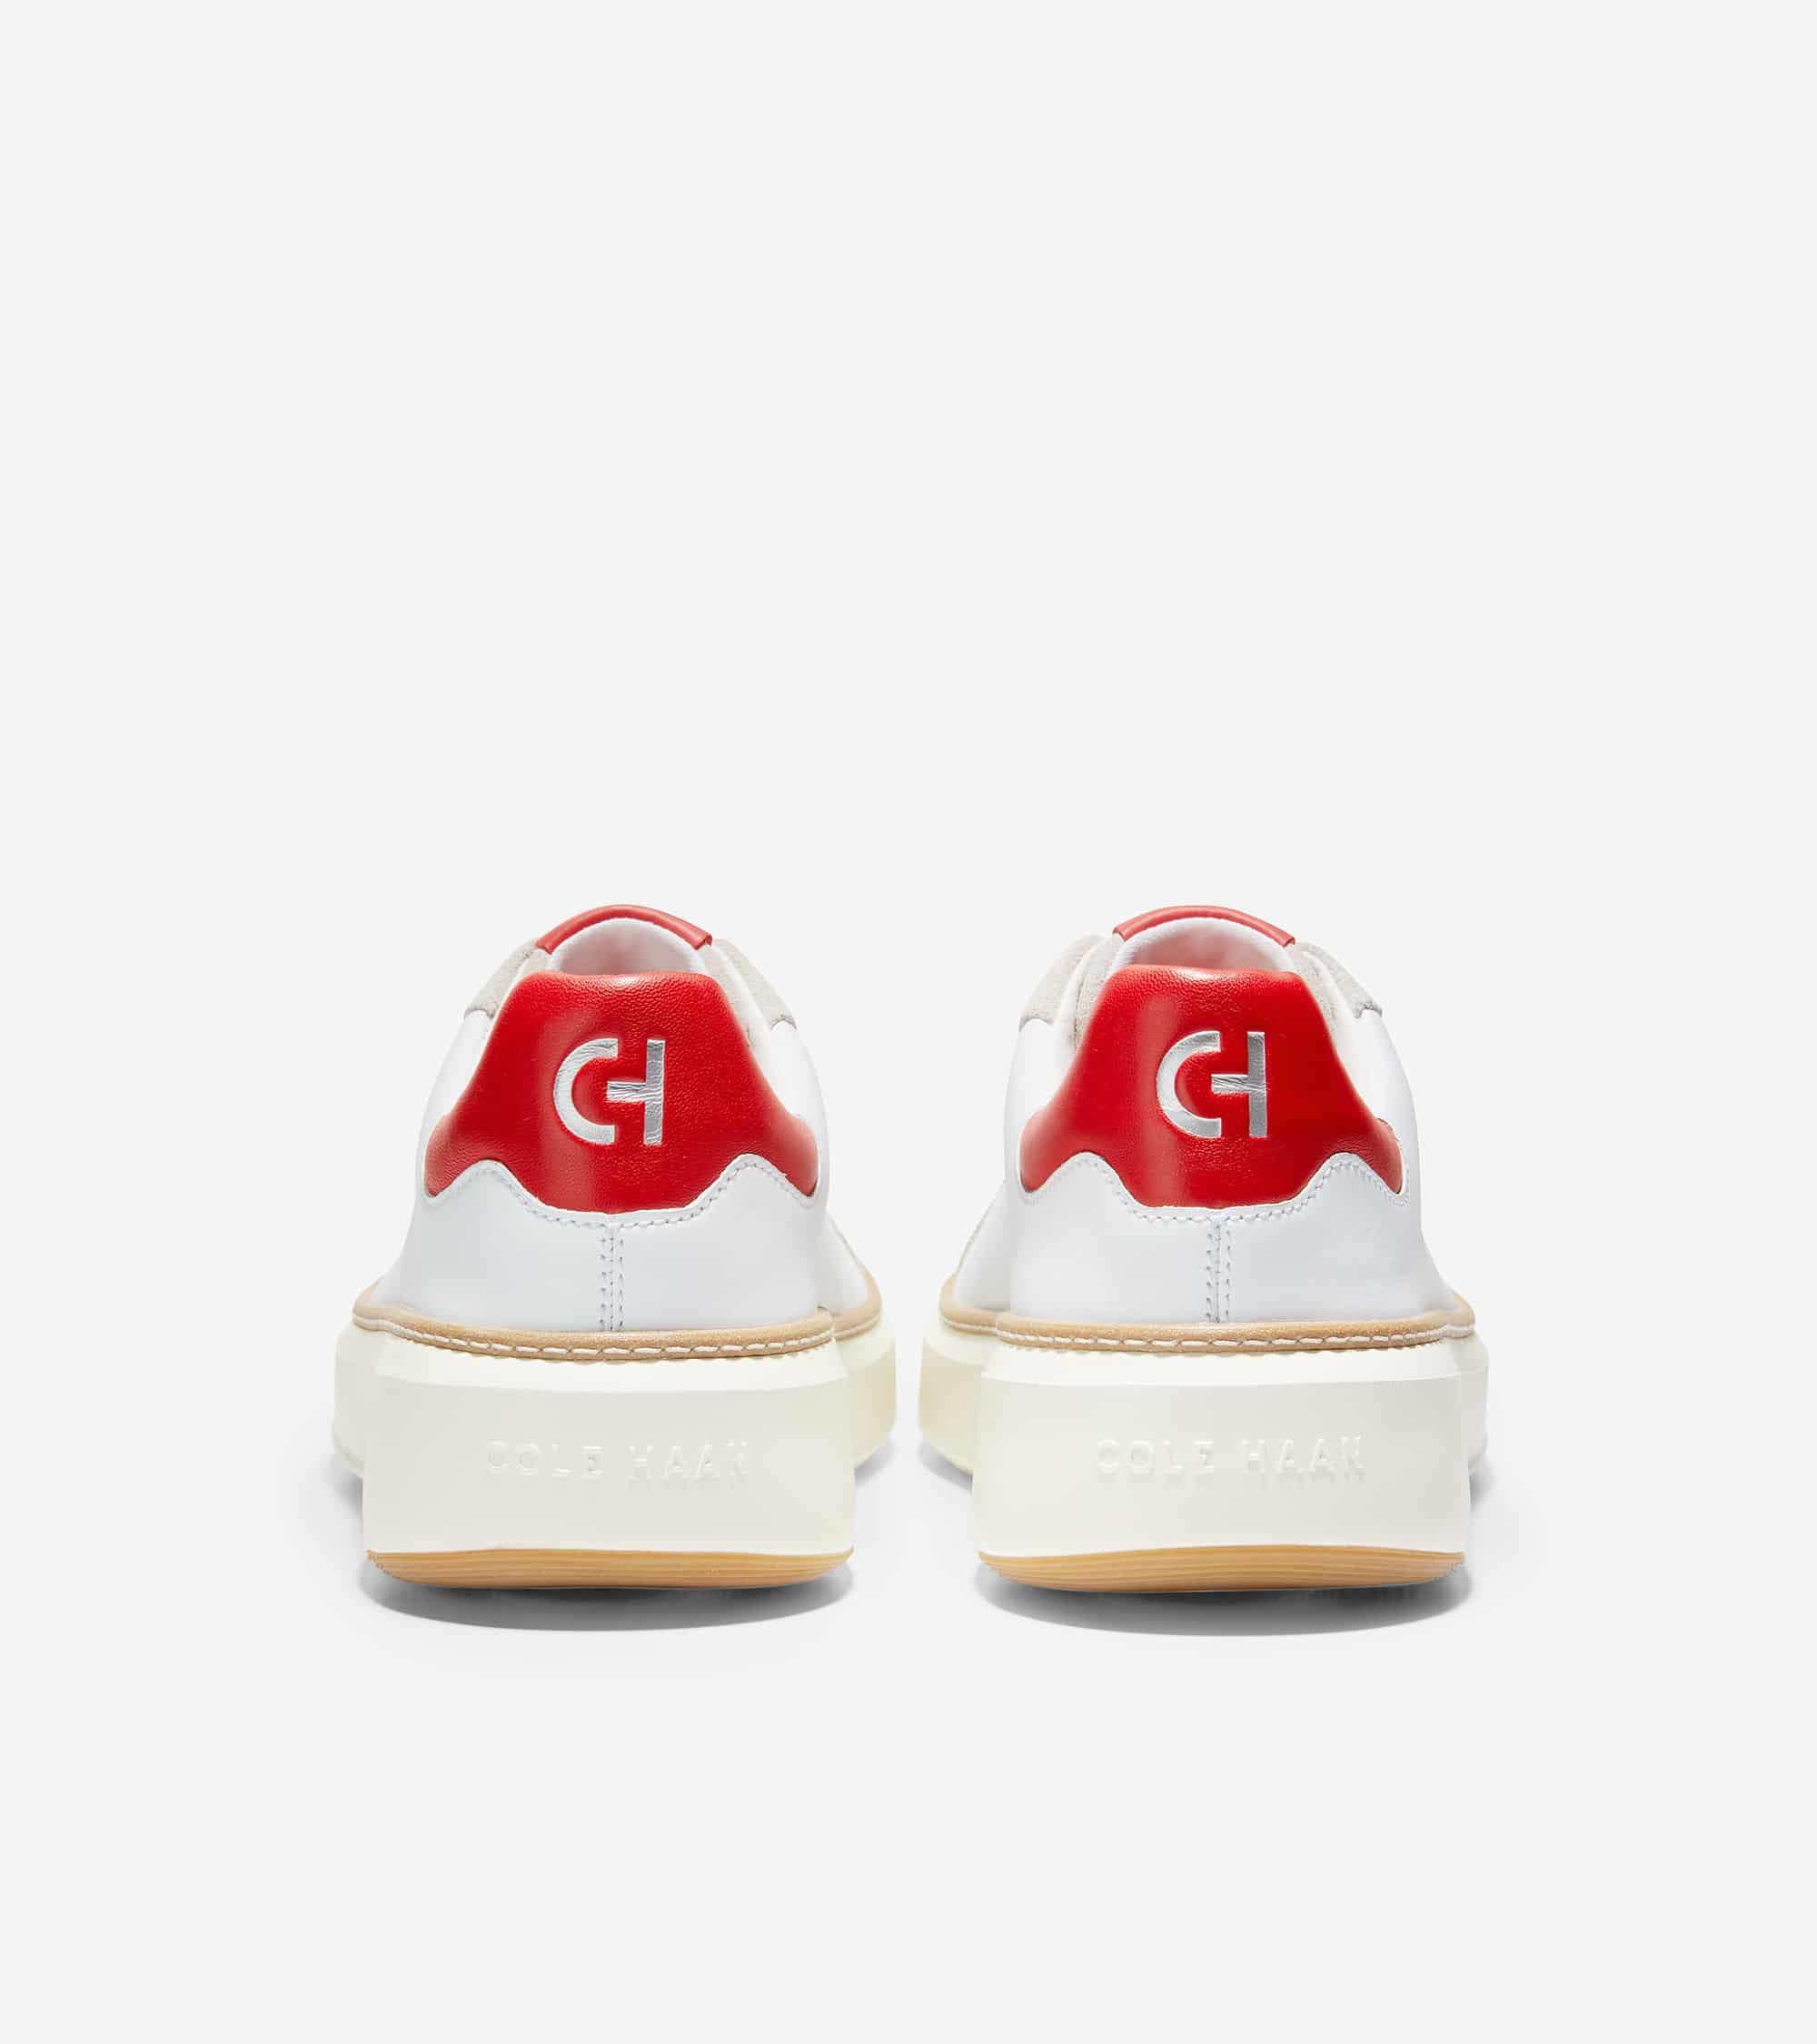 Cole Haan Grandprø Topspin Sneaker Optic White/Molten Lava